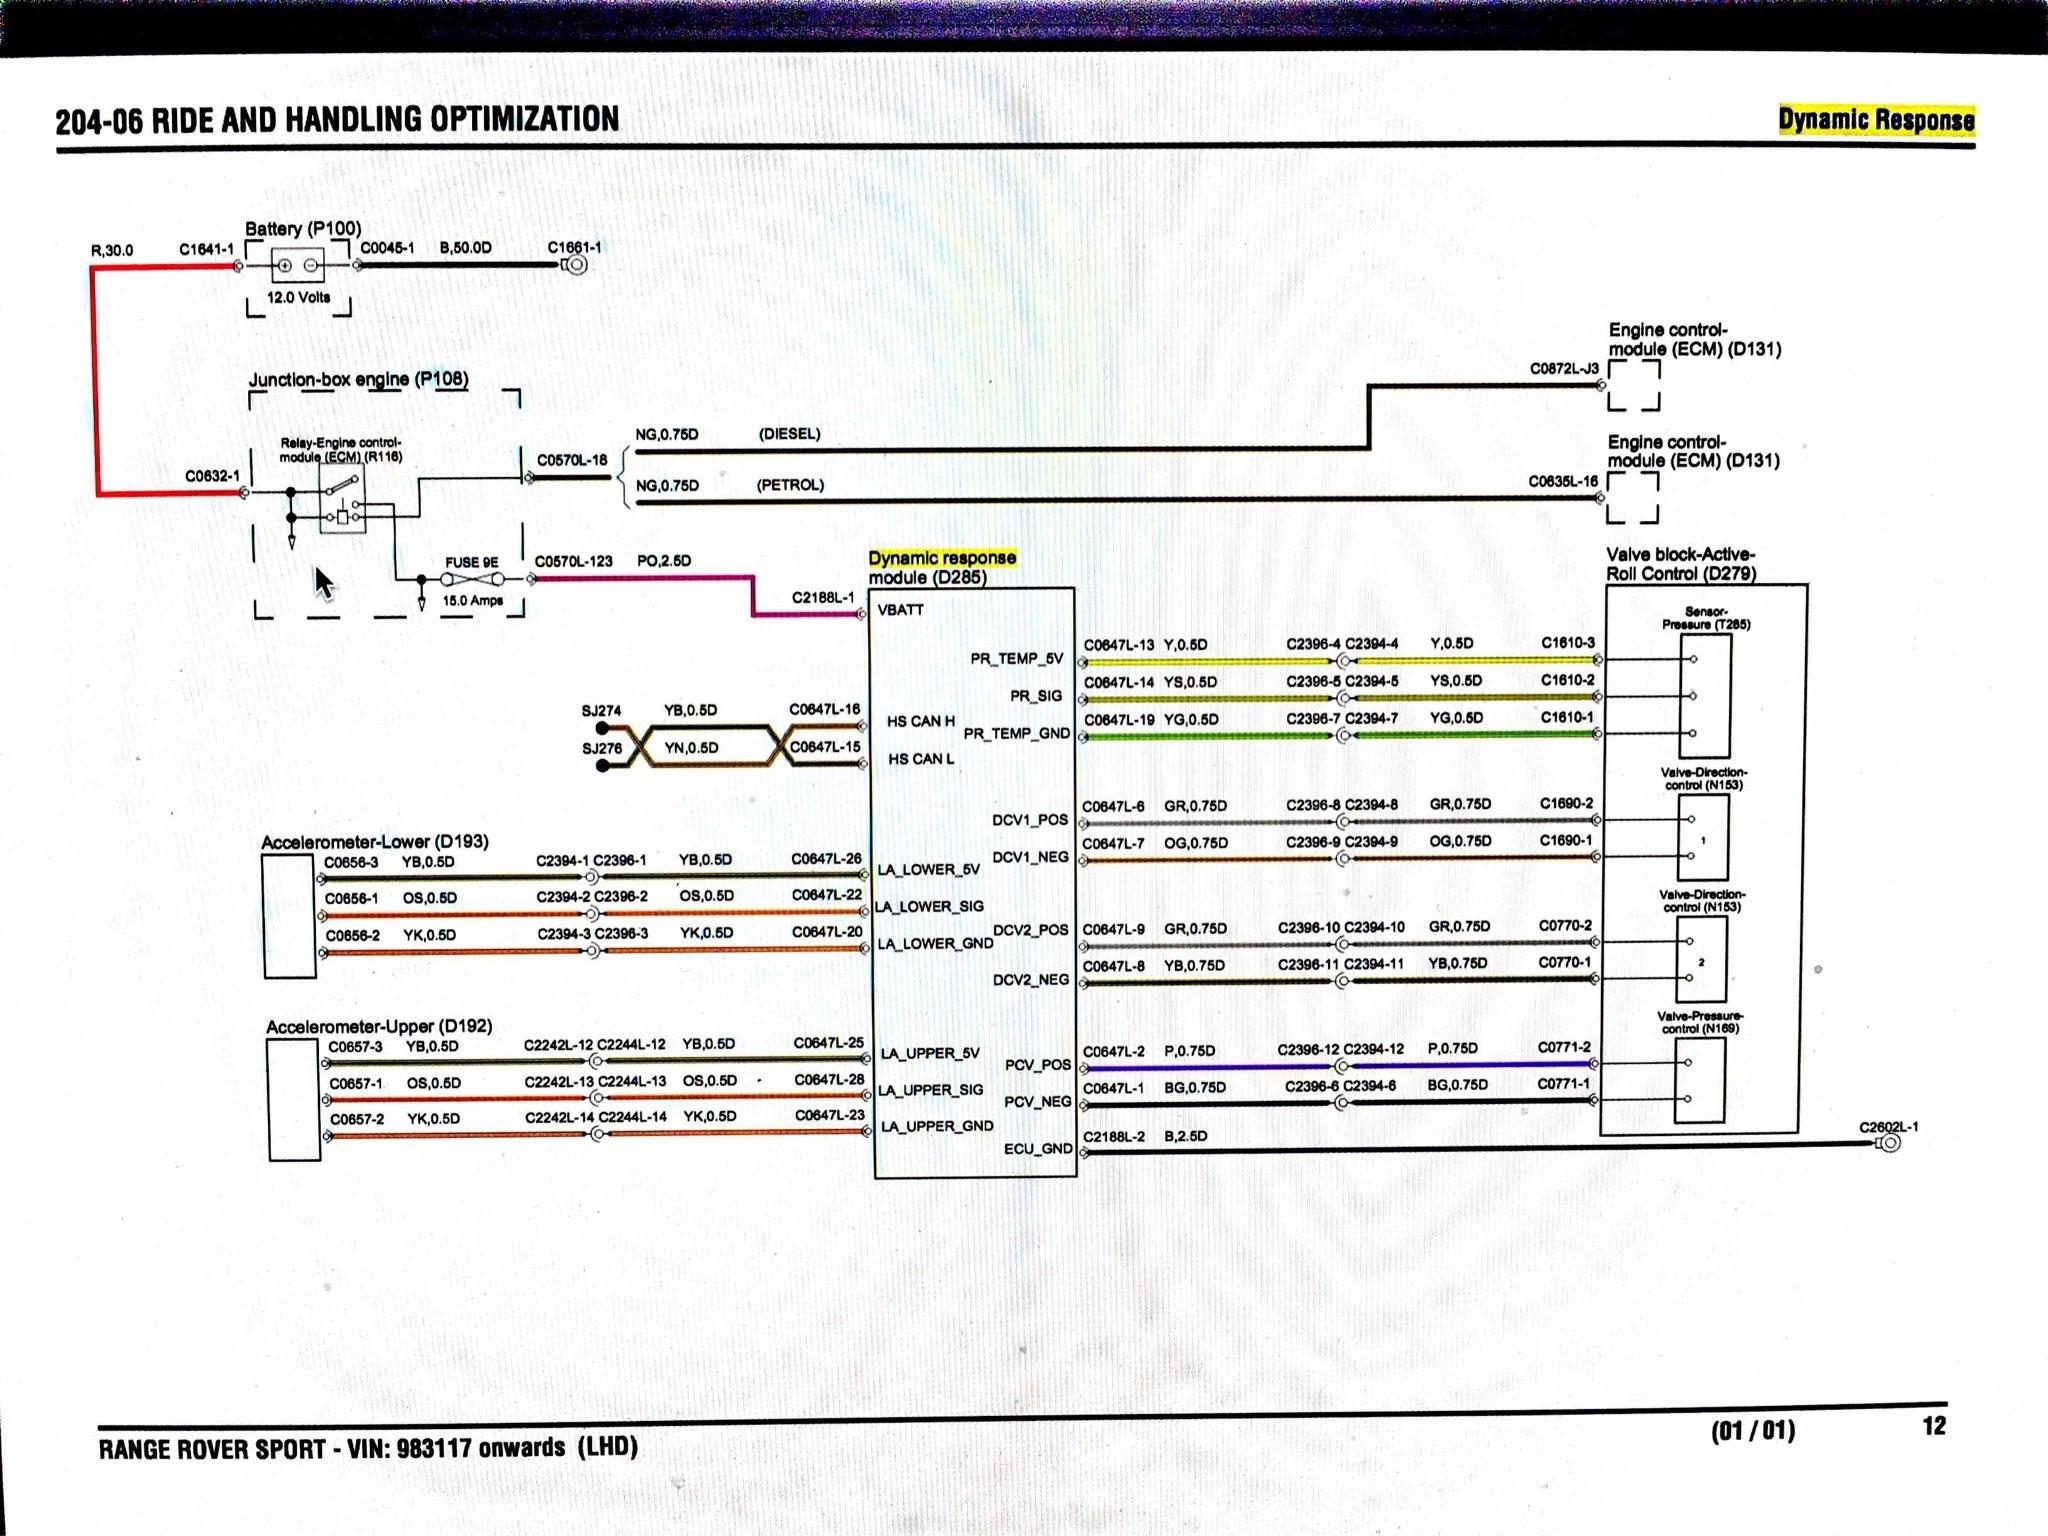 Iskra Alternators Connection Diagram Diagram] Range Rover Sport Wiring Diagram Full Version Hd Of Iskra Alternators Connection Diagram